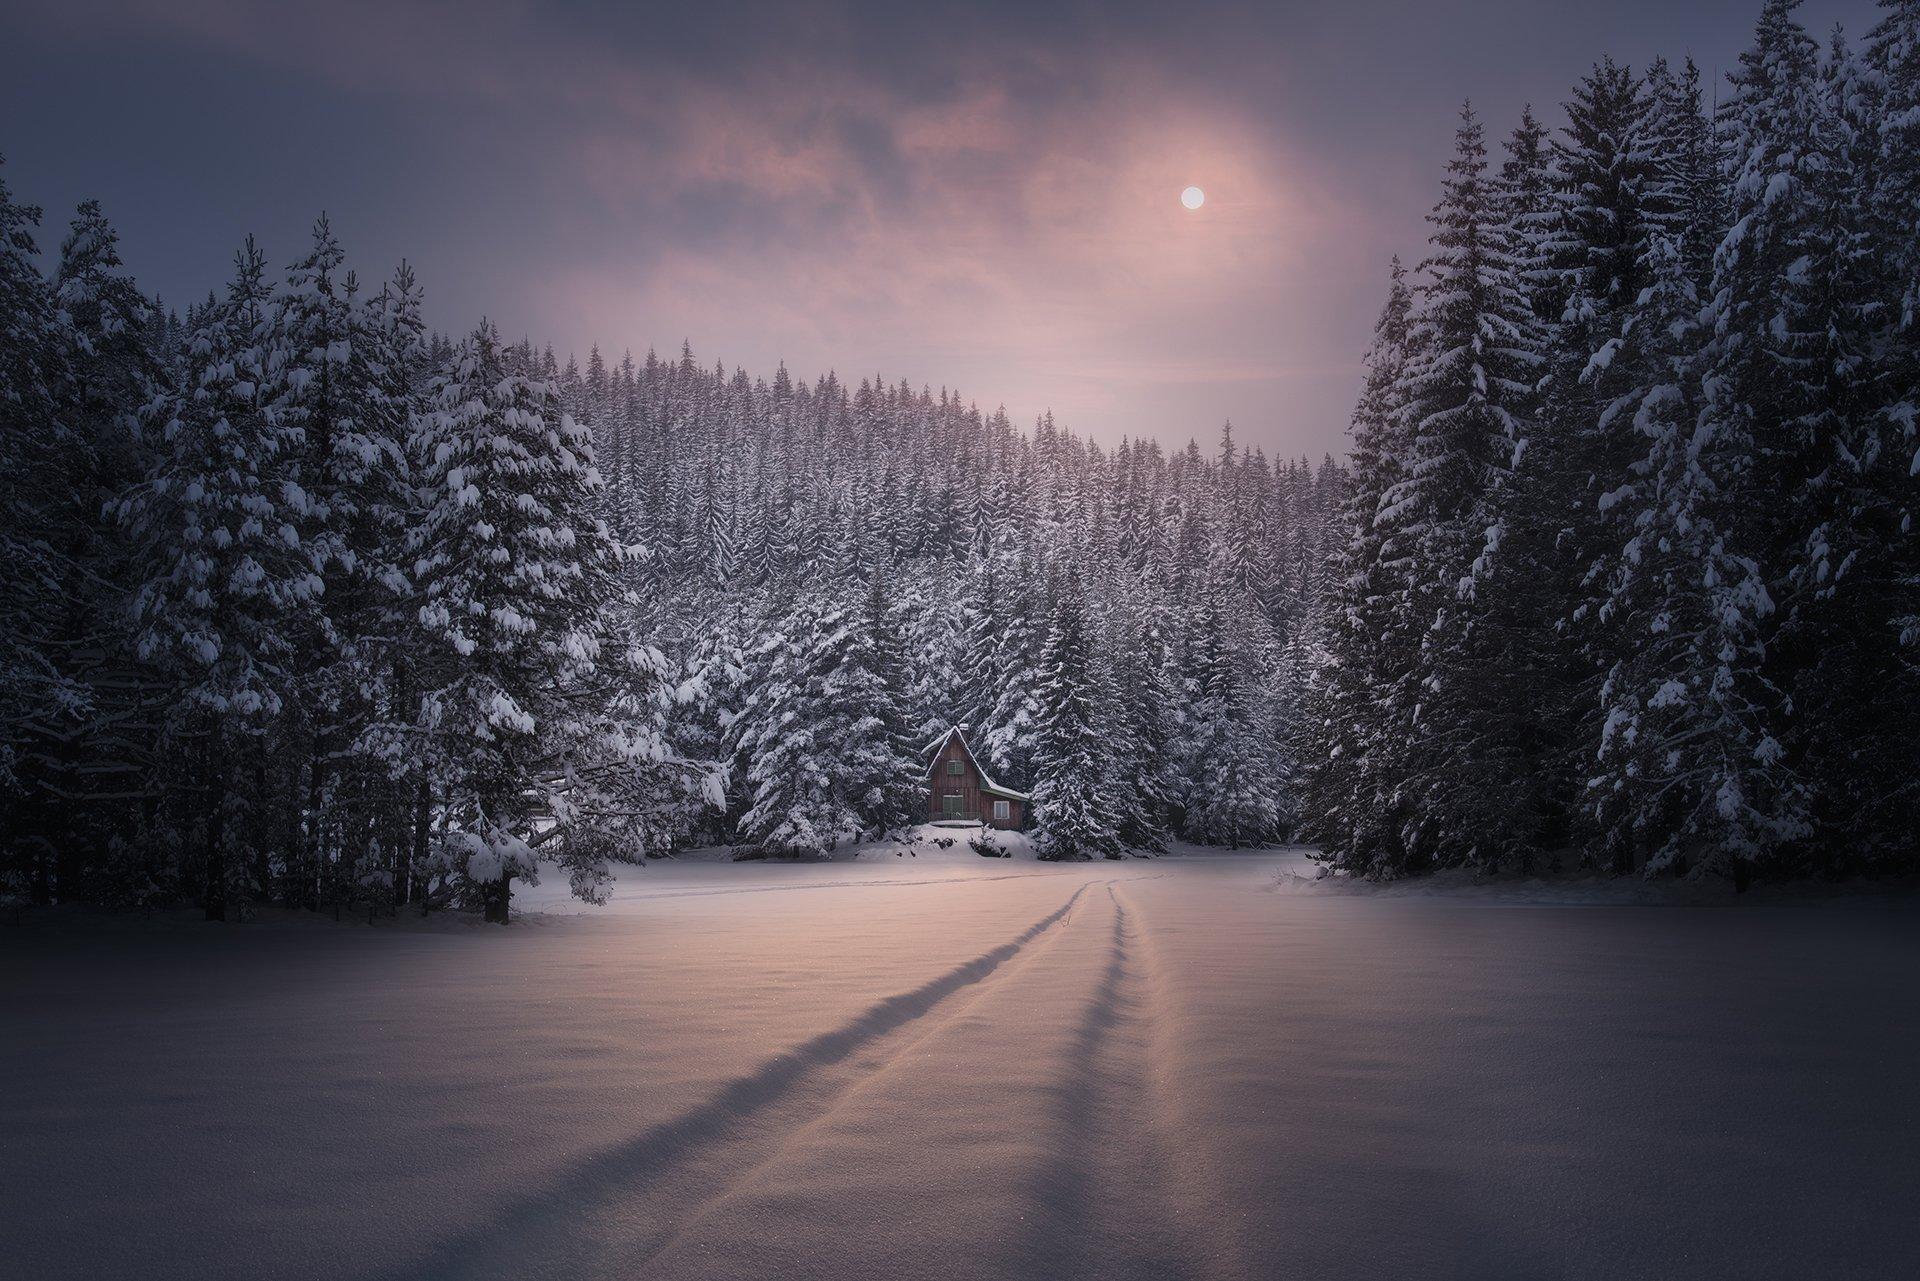 пейзаж, природа, landscape, nature, winter, hut, Genadi Dochev